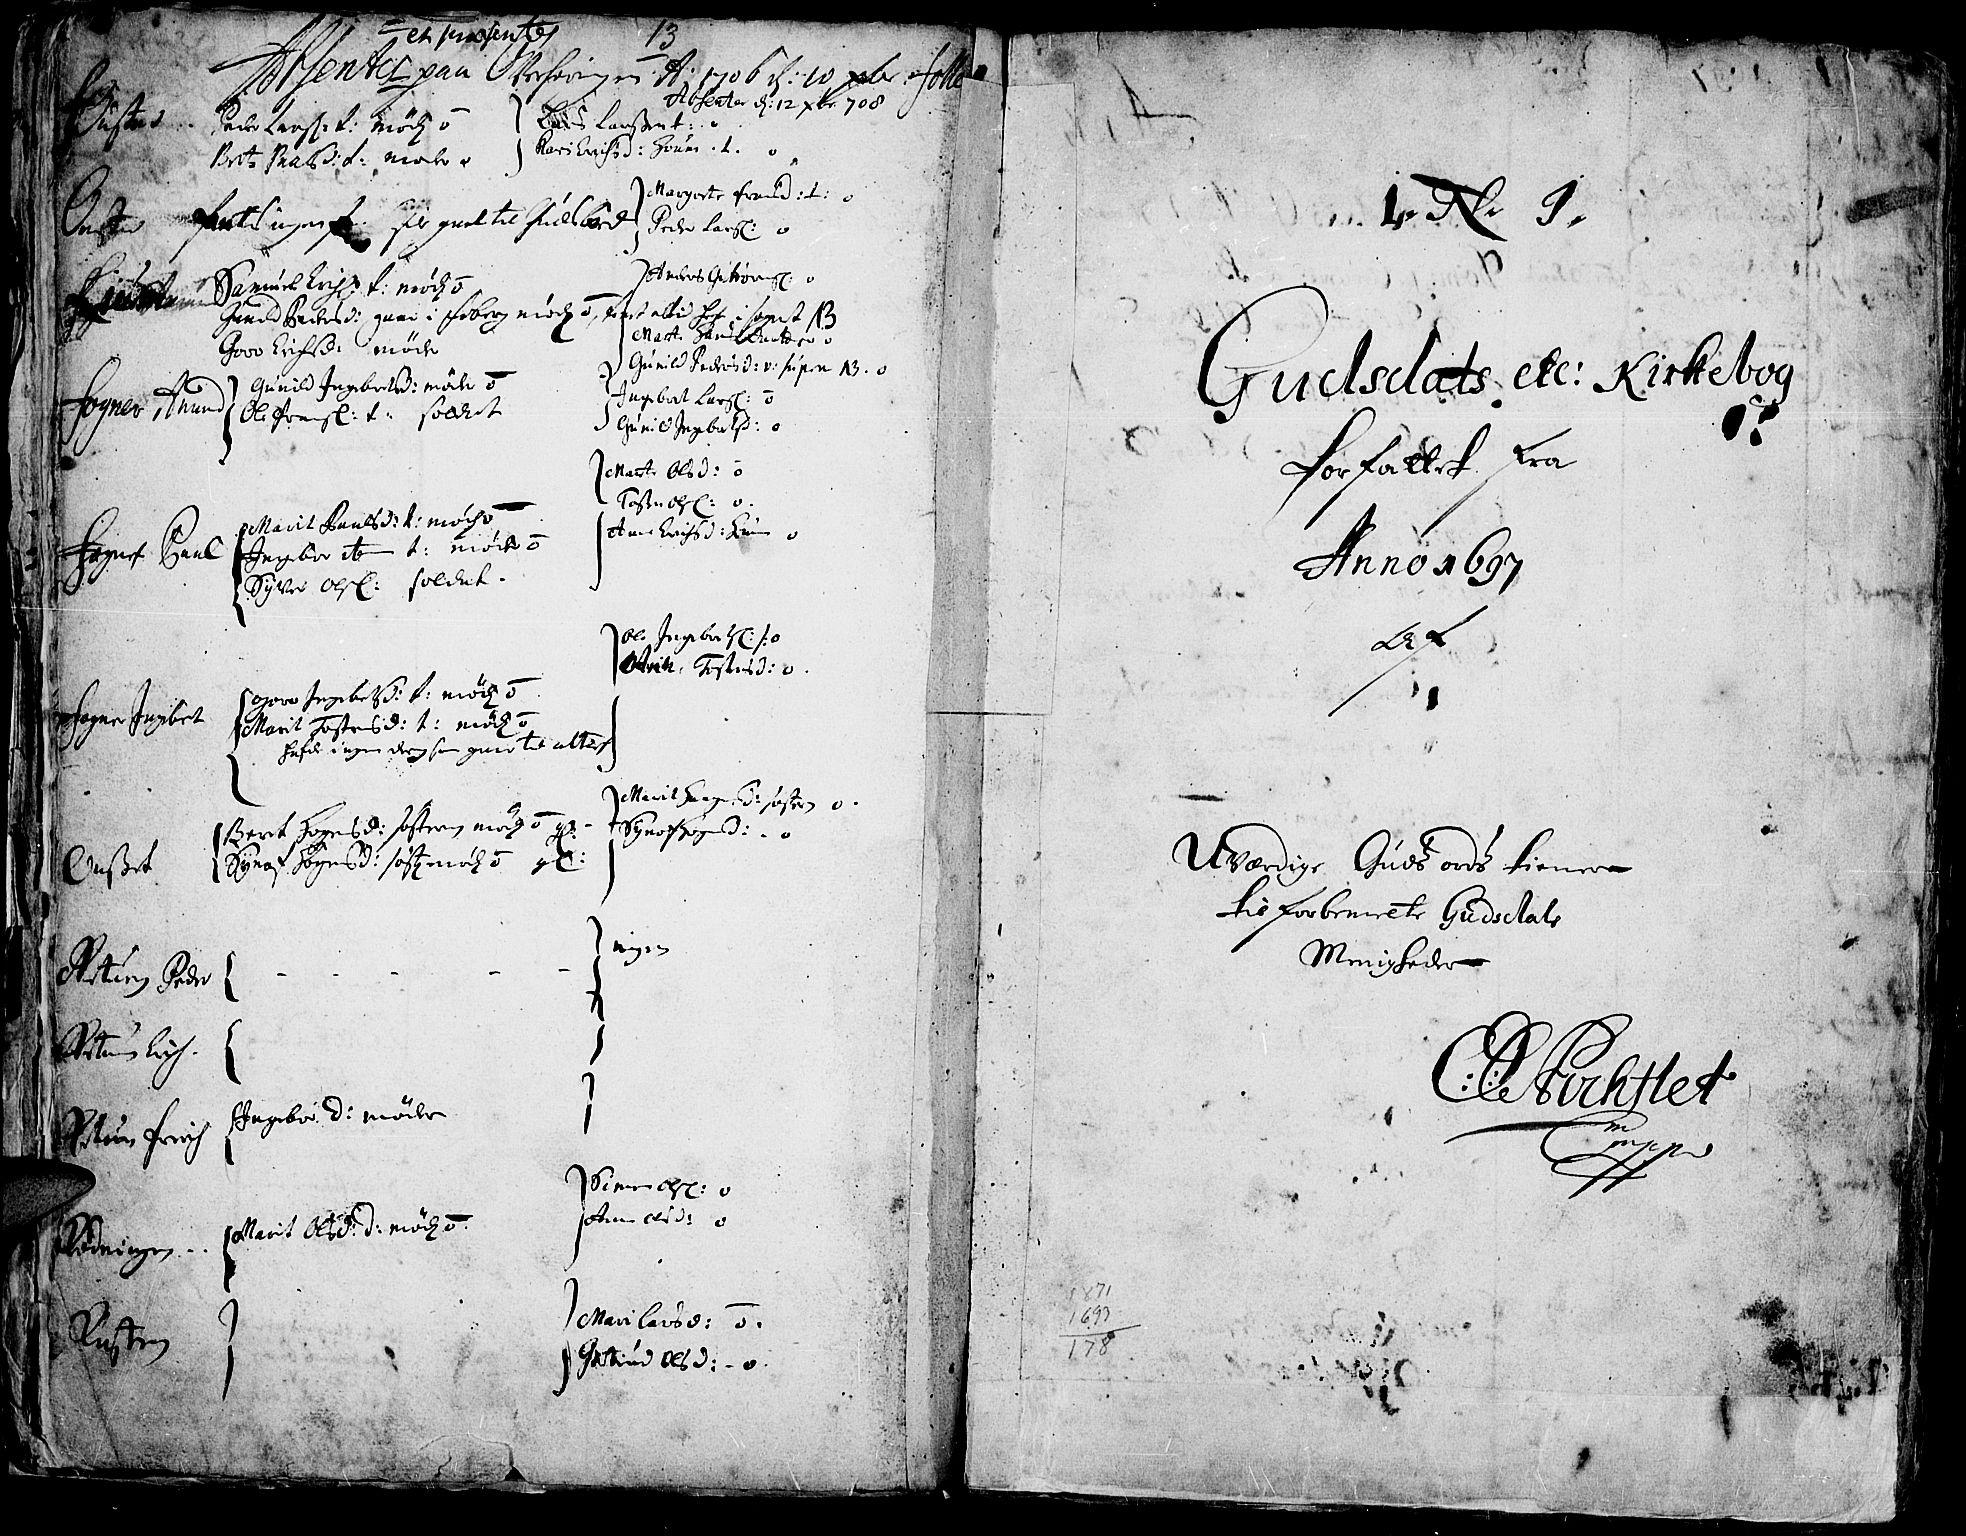 SAH, Gausdal prestekontor, Ministerialbok nr. 1, 1693-1728, s. 13